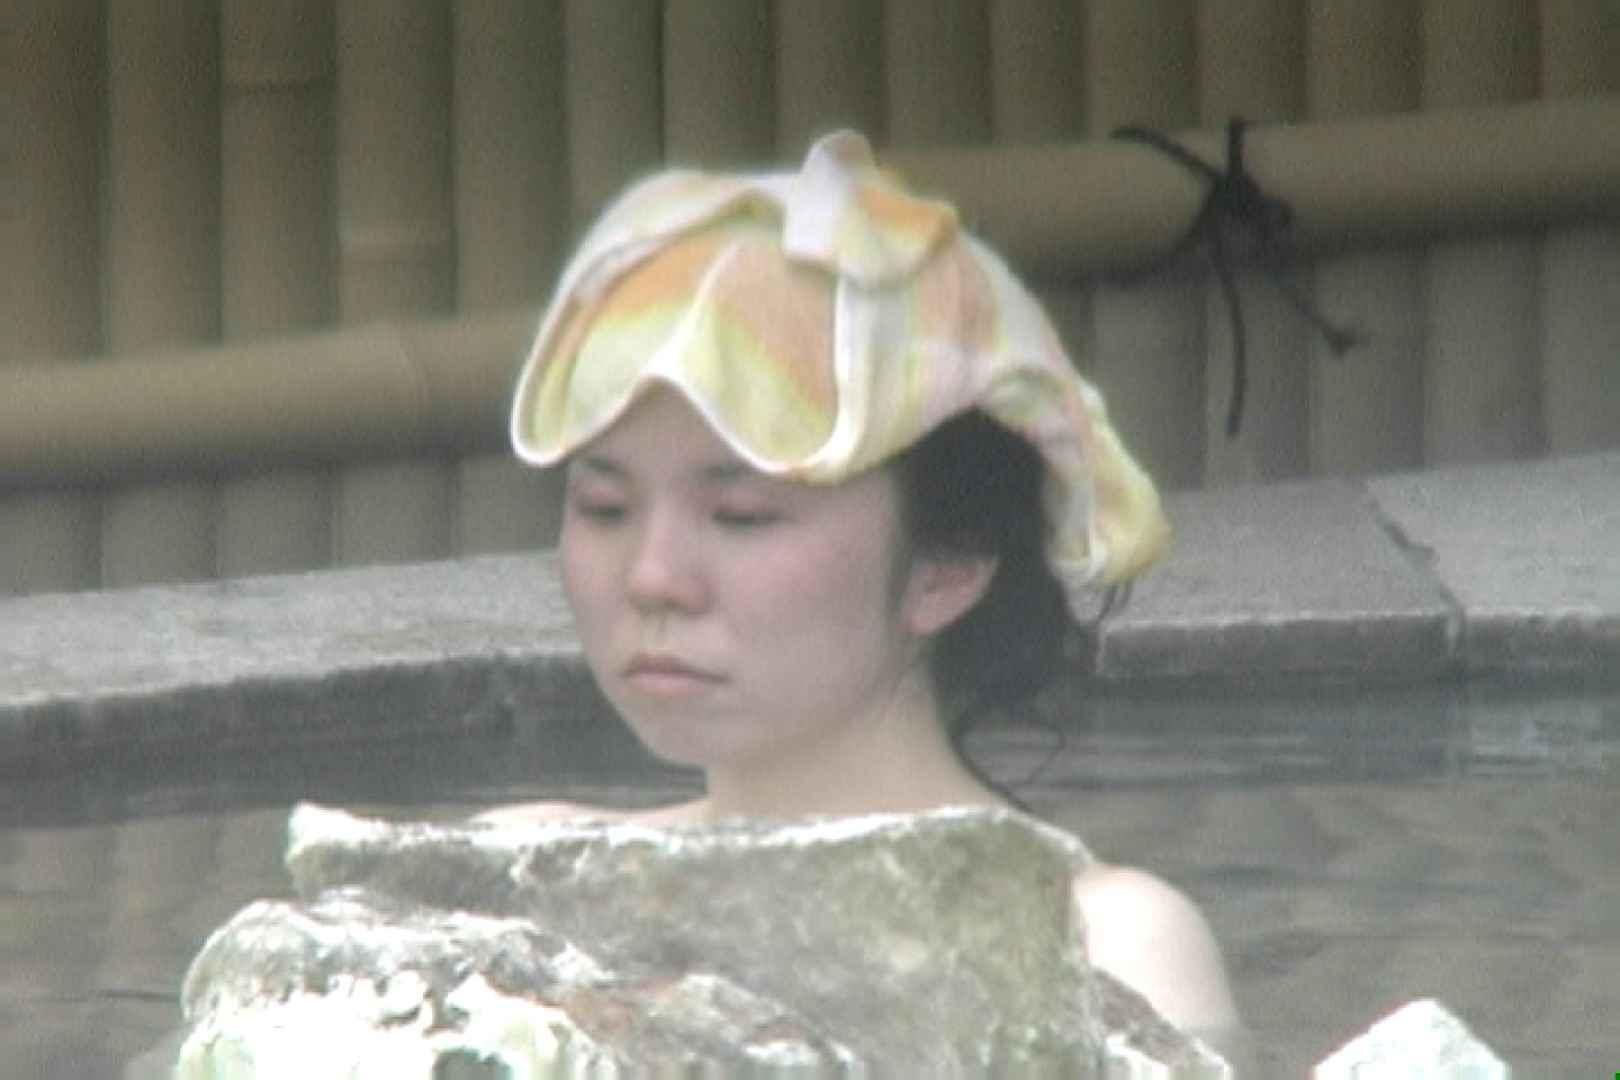 Aquaな露天風呂Vol.687 盗撮シリーズ | 露天風呂編  93PIX 65